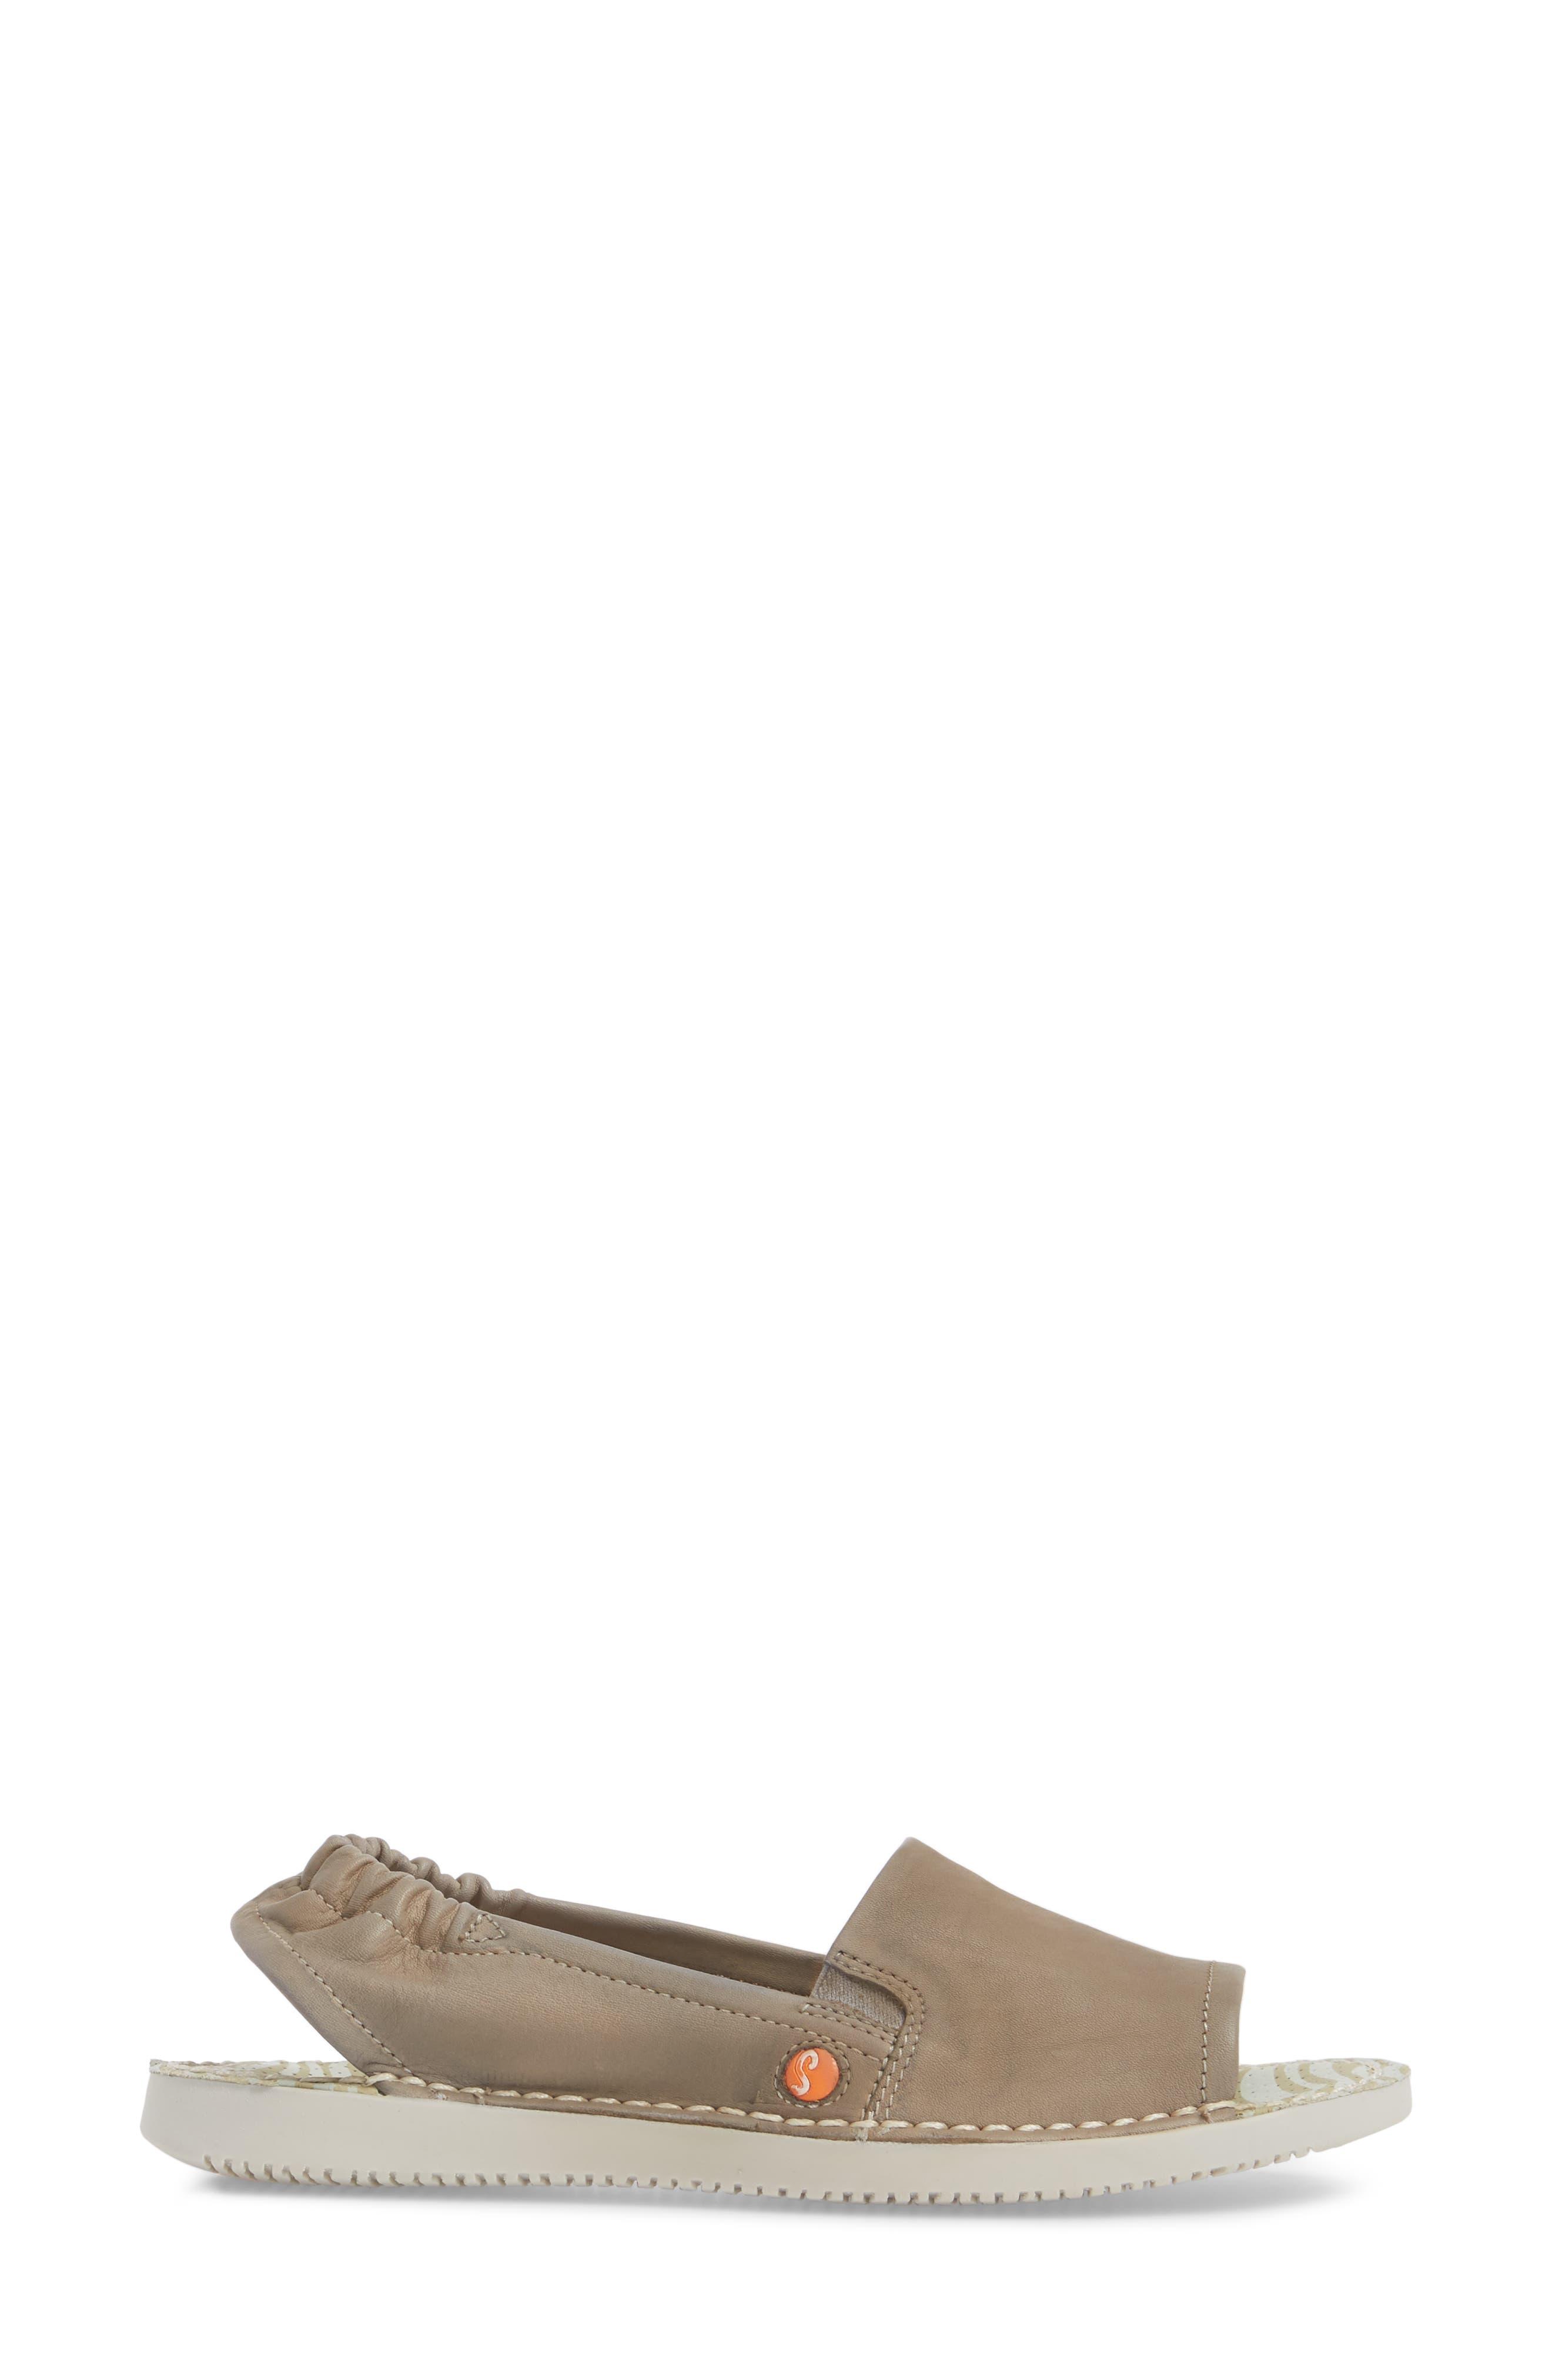 Tee Flat Sandal,                             Alternate thumbnail 3, color,                             Taupe Leather